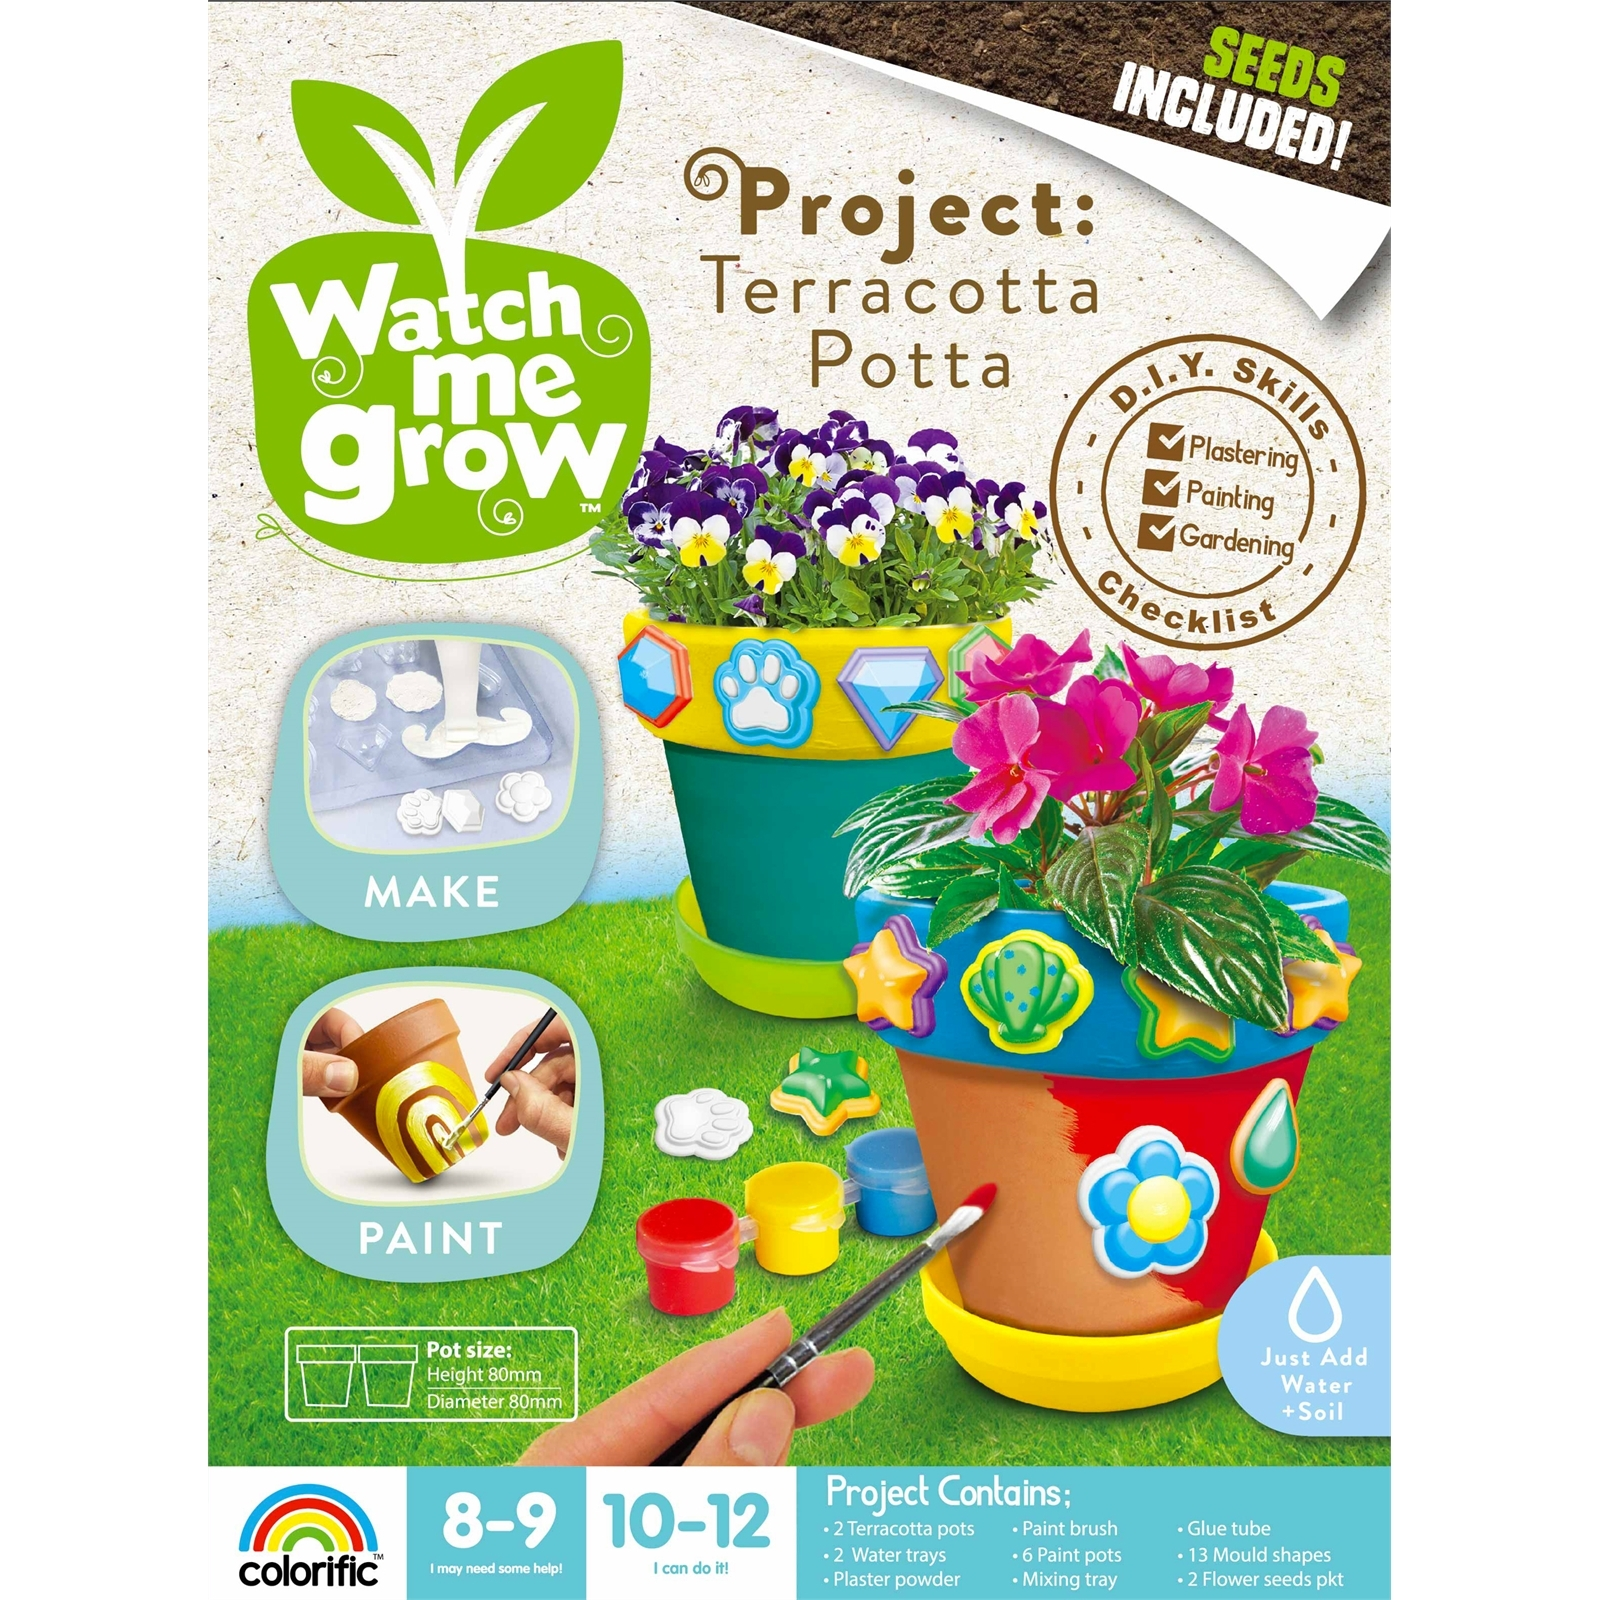 Watch Me Grow Terracotta Potta